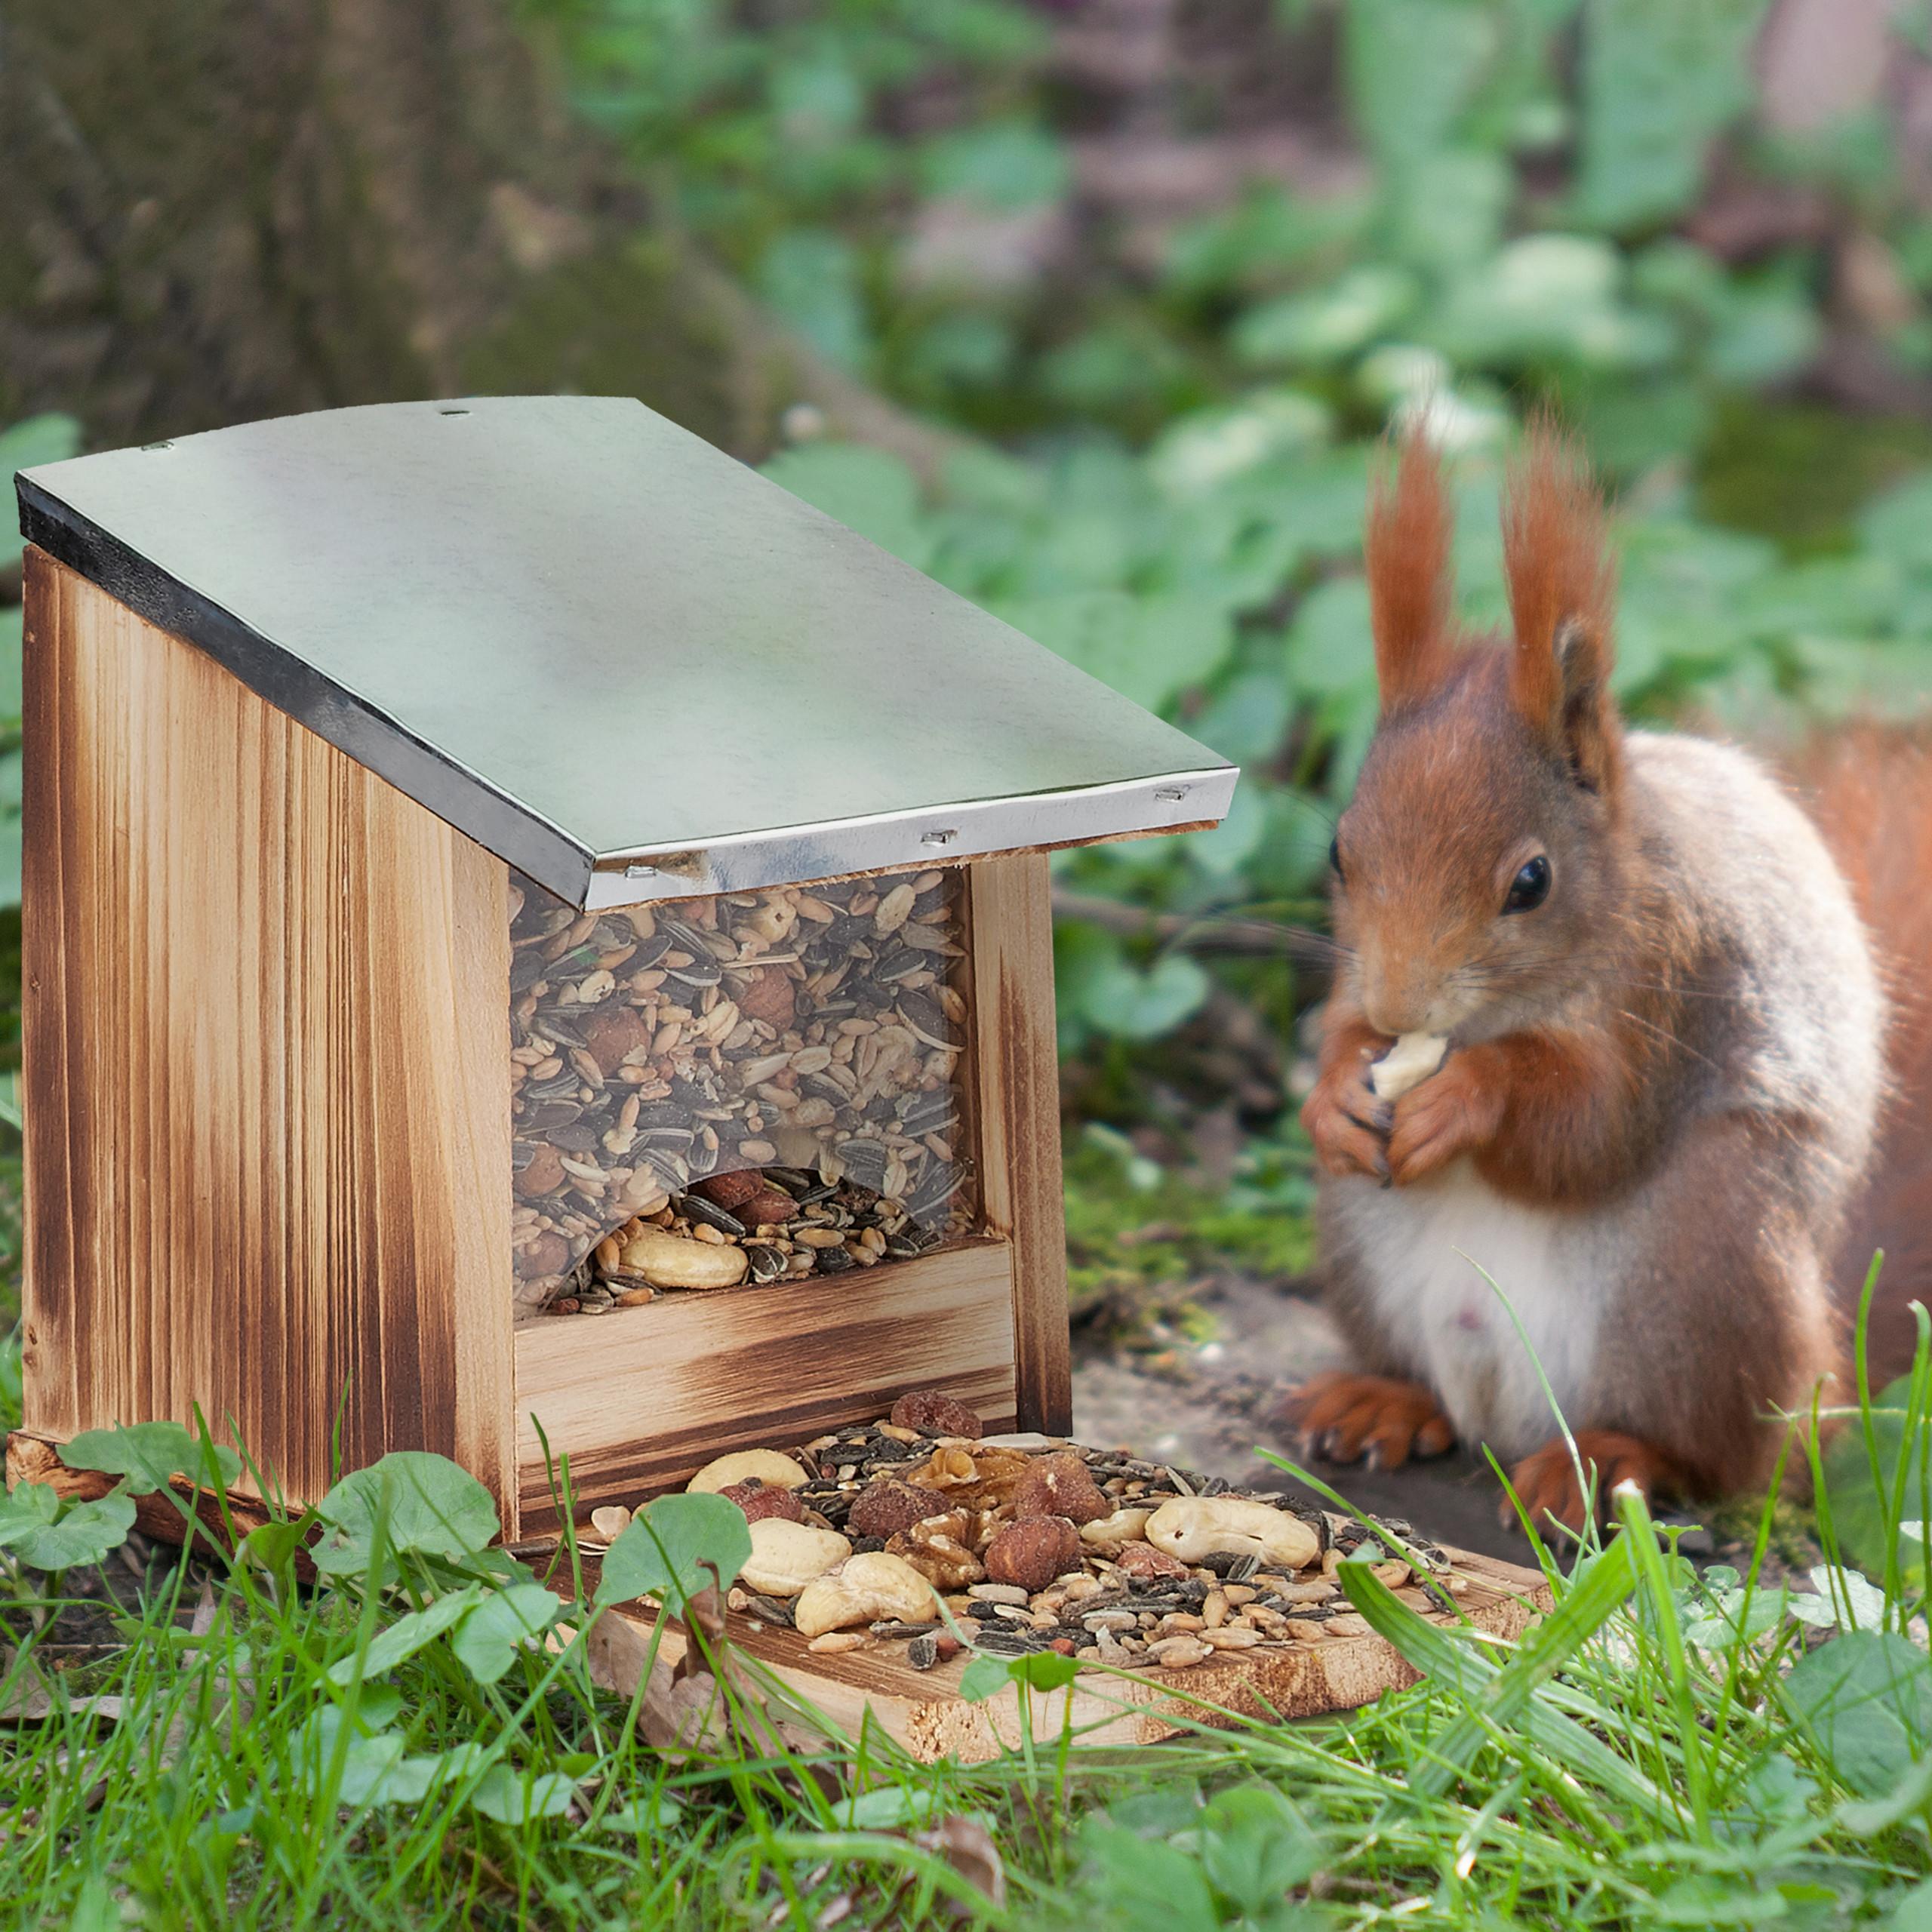 eekhoorn-voederhuisje-metalen-dak-hout-voederhuis-voederkast miniatuur 6